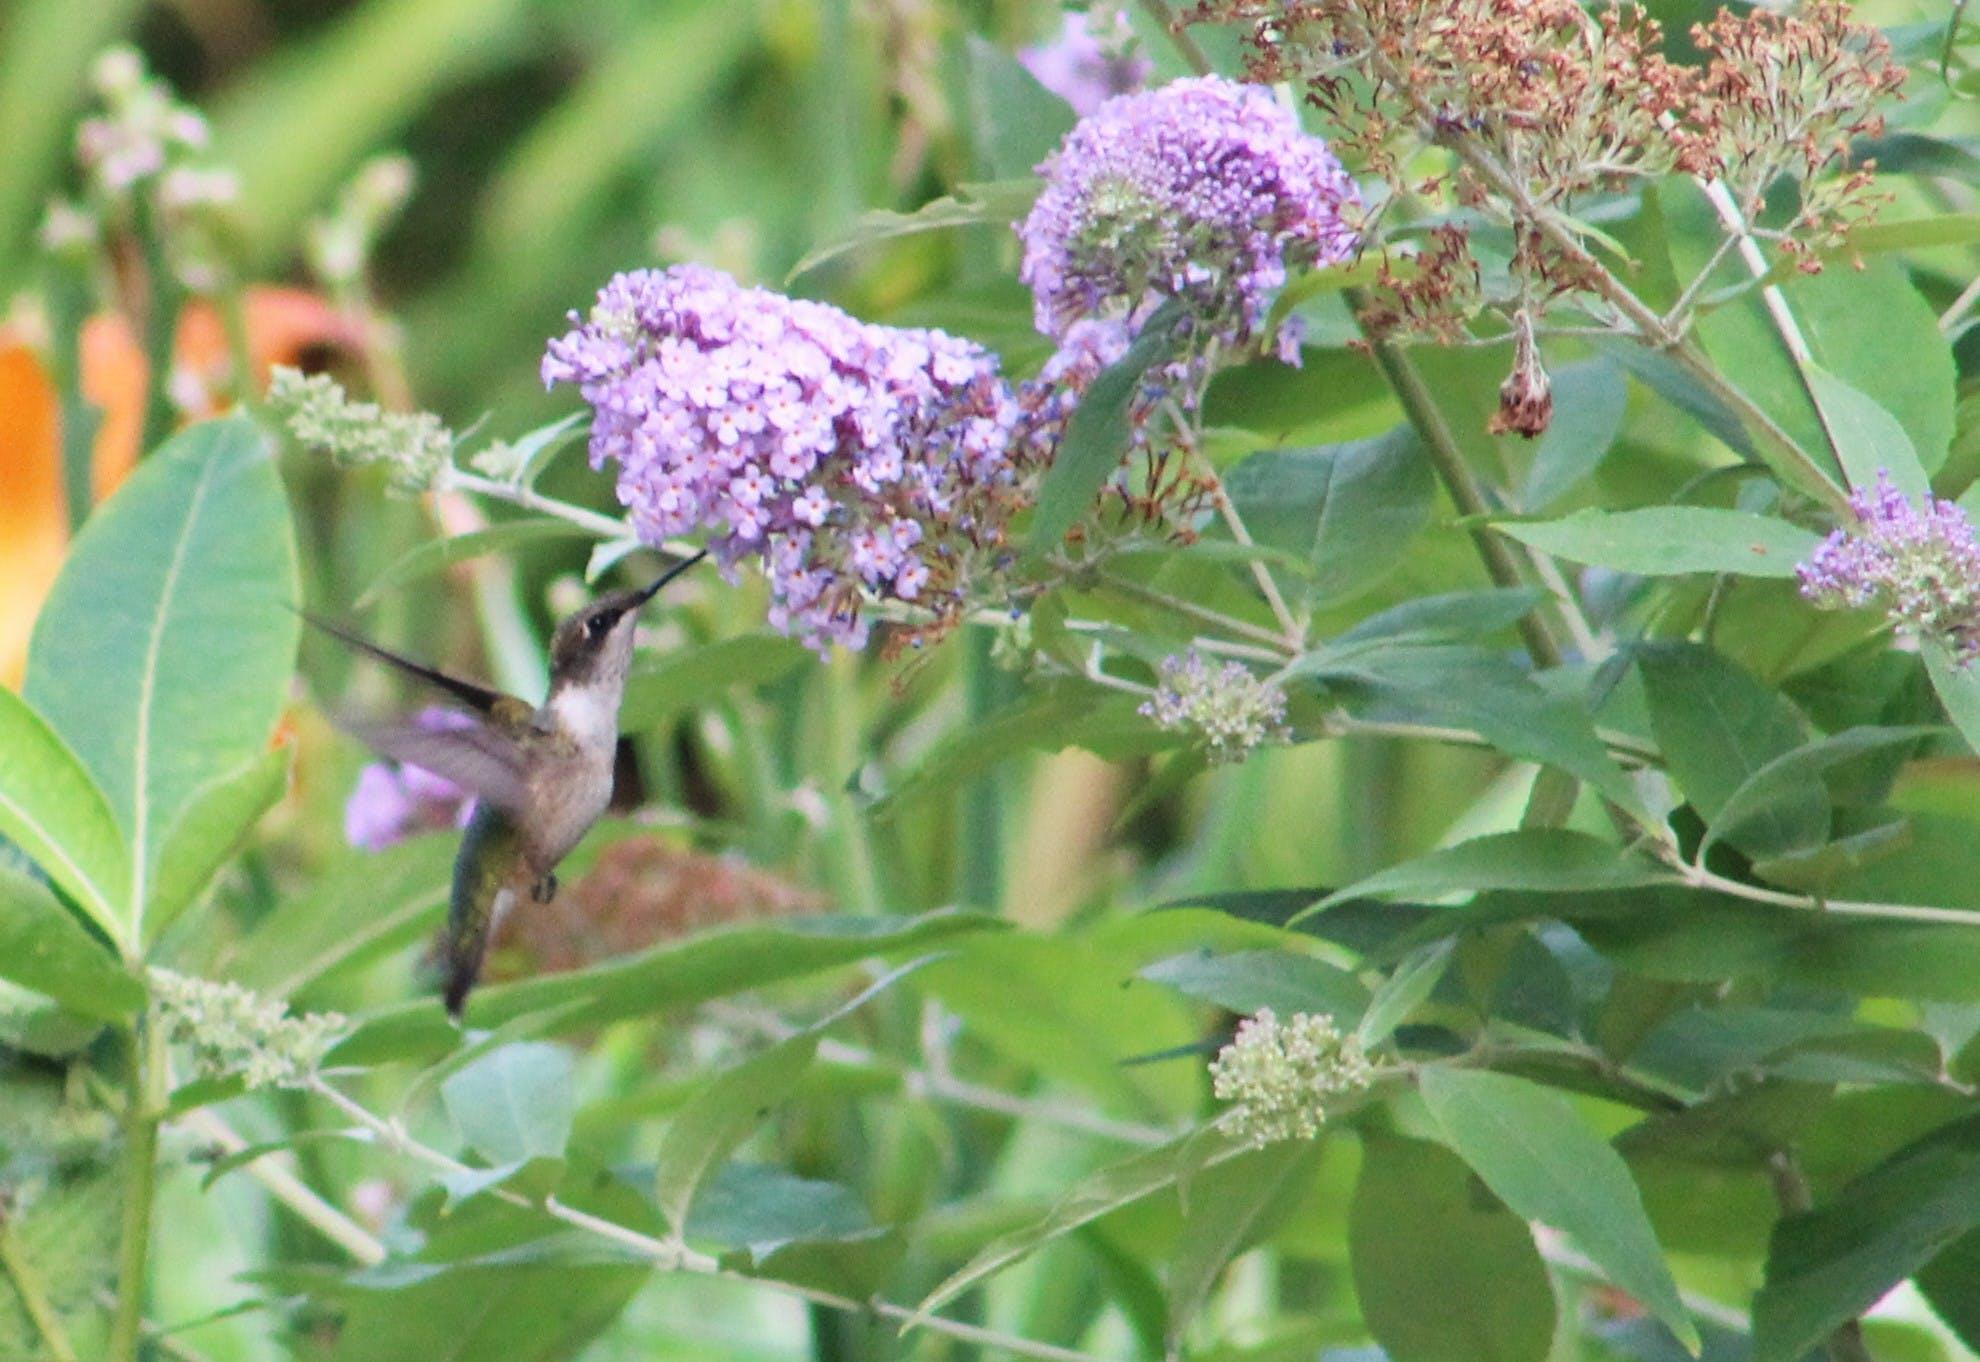 Free stock photo of female birds, flying hummingbird, hummingbird, hummingbird and flower